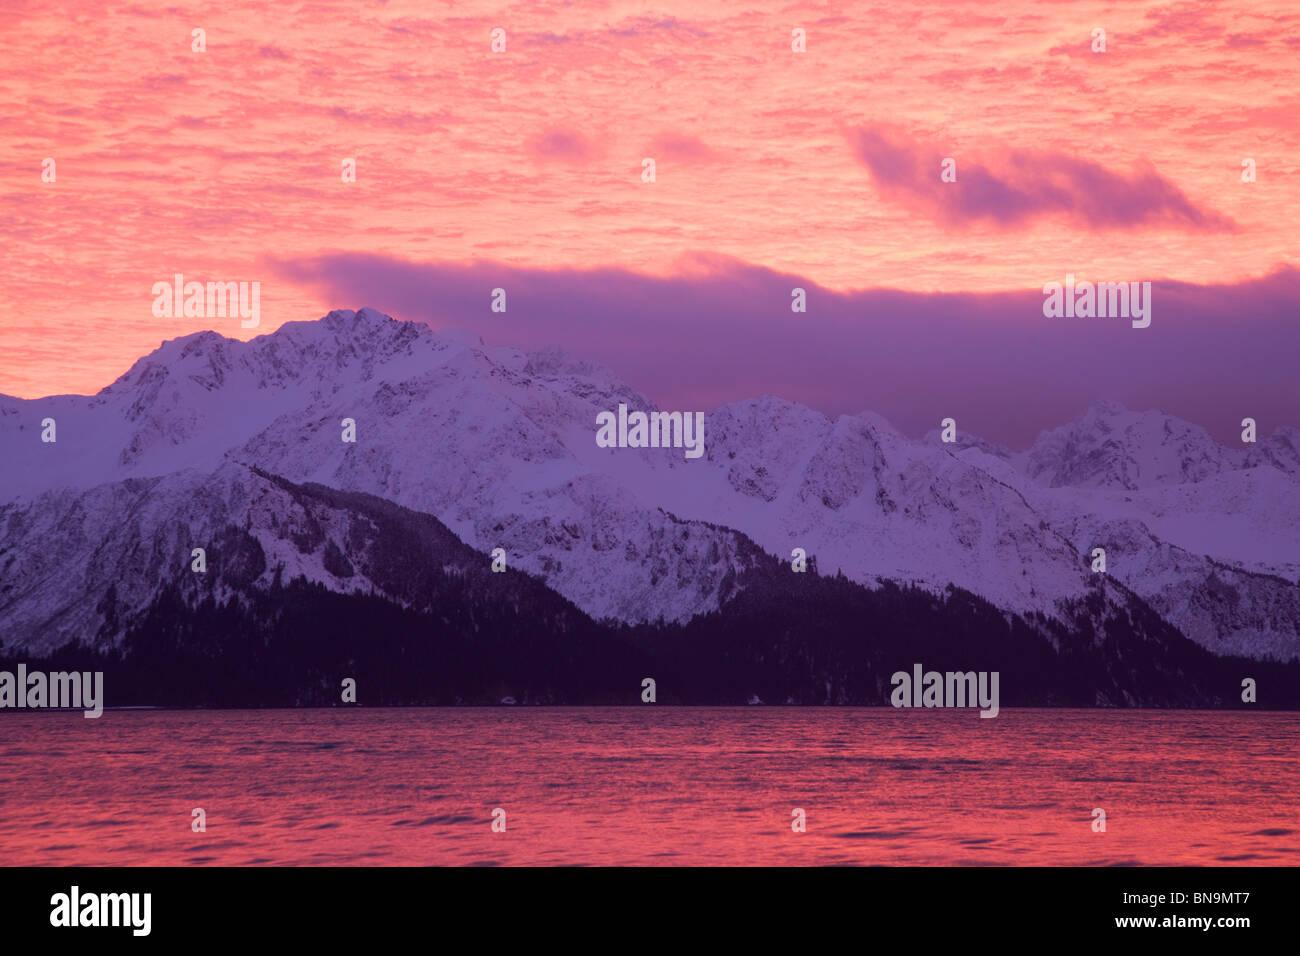 Resurrection Bay at sunrise, Seward, Alaska. - Stock Image